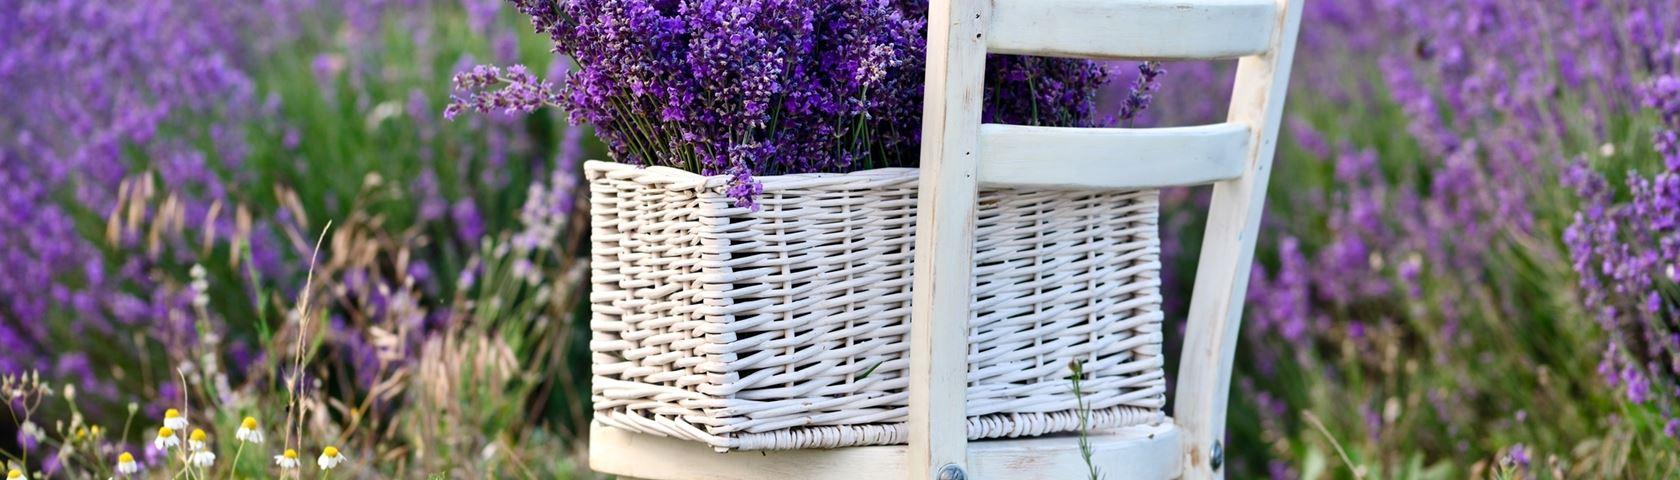 Fresh Lavender Morning